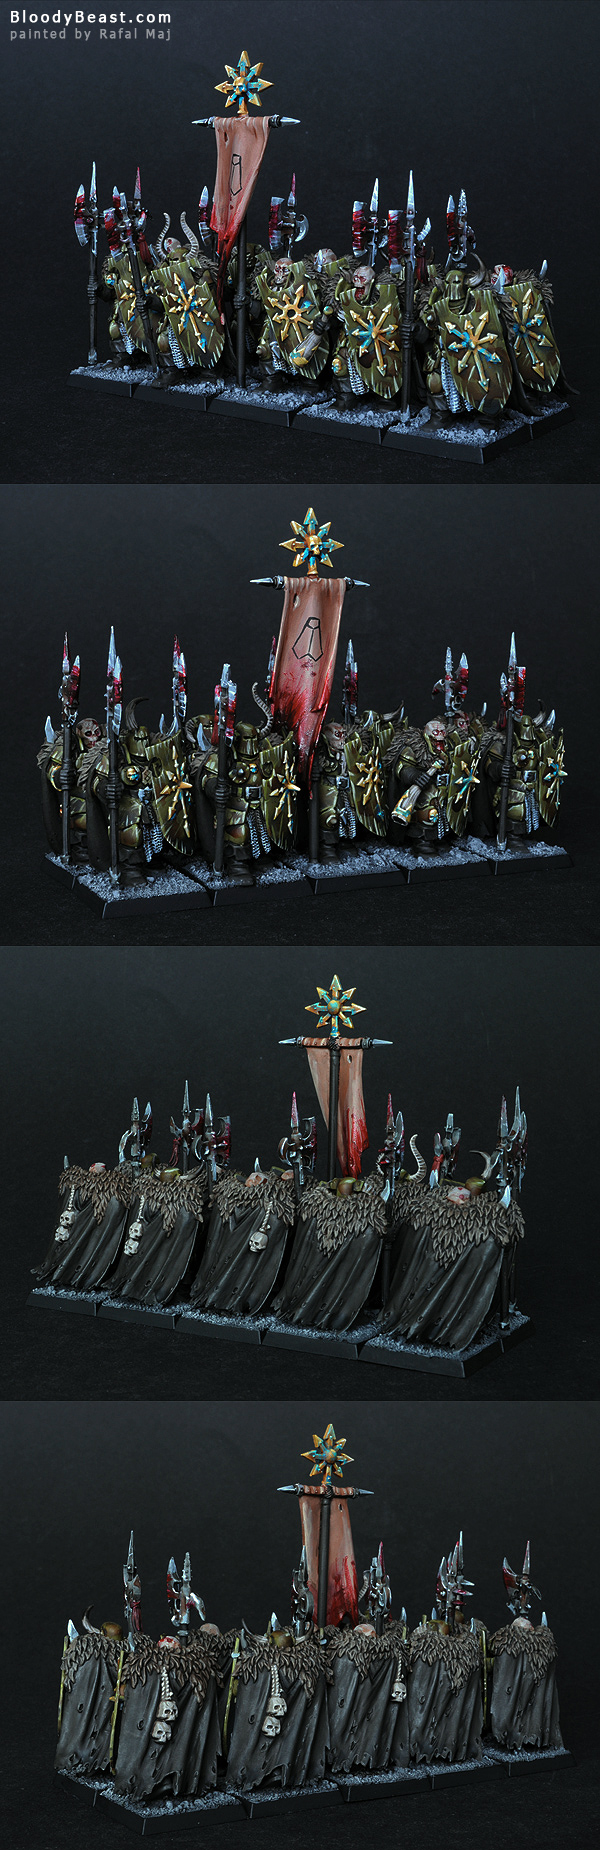 Chaos Warriors Of Nurgle painted by Rafal Maj (BloodyBeast.com)